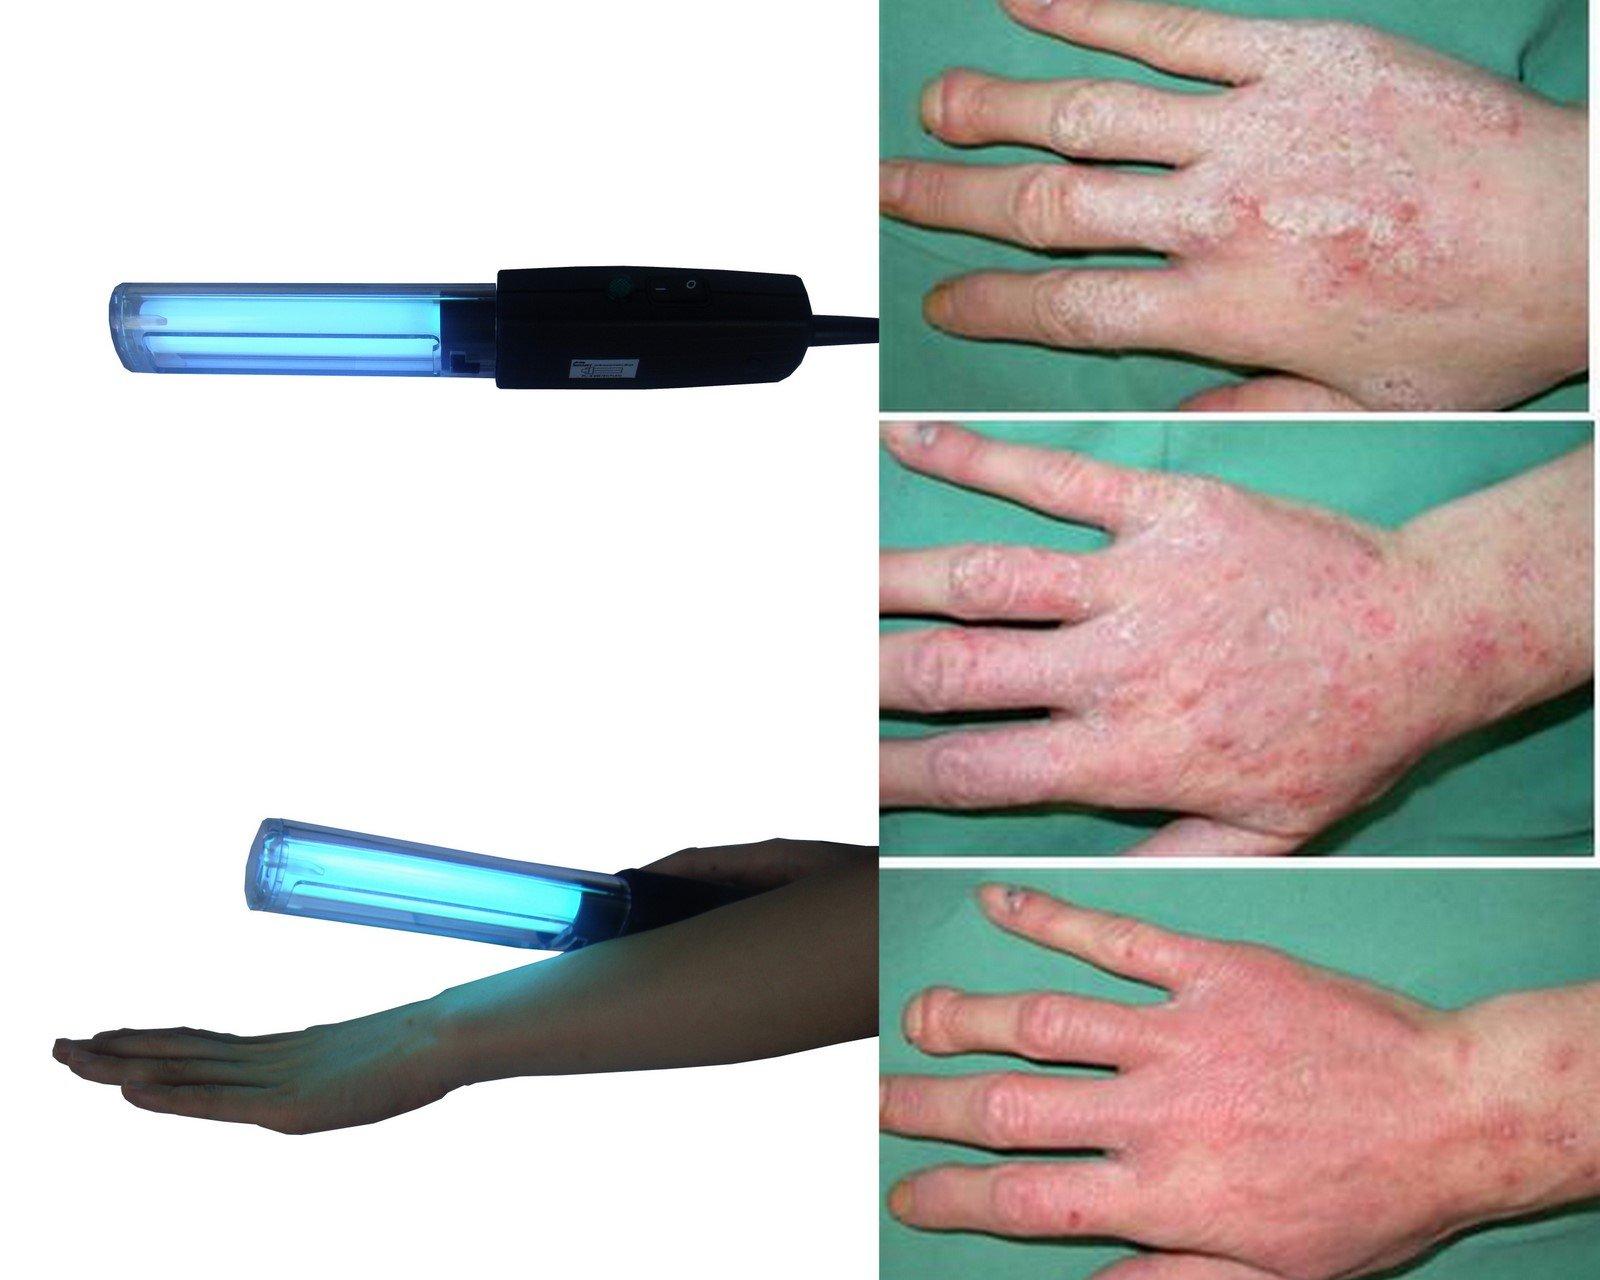 Uvb 311nm Phototherapy- Psoriasis,Vitiligo,Eczema,Atopic ...